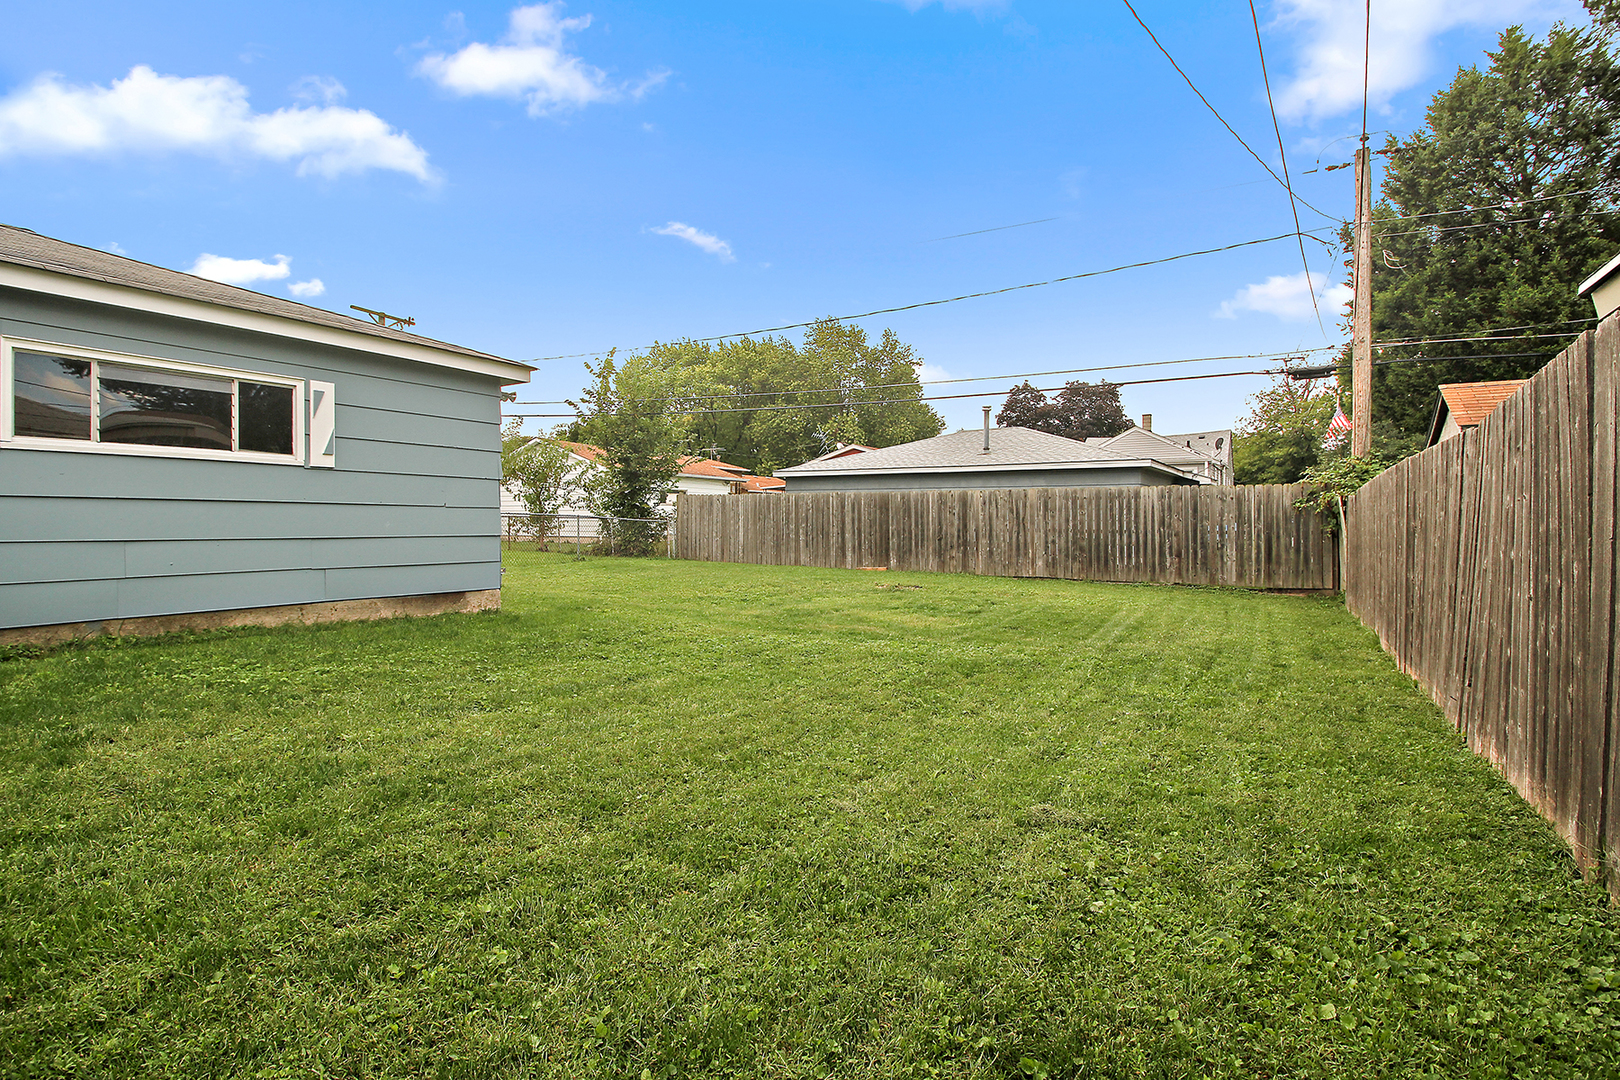 14444 Keeler, Midlothian, Illinois, 60445